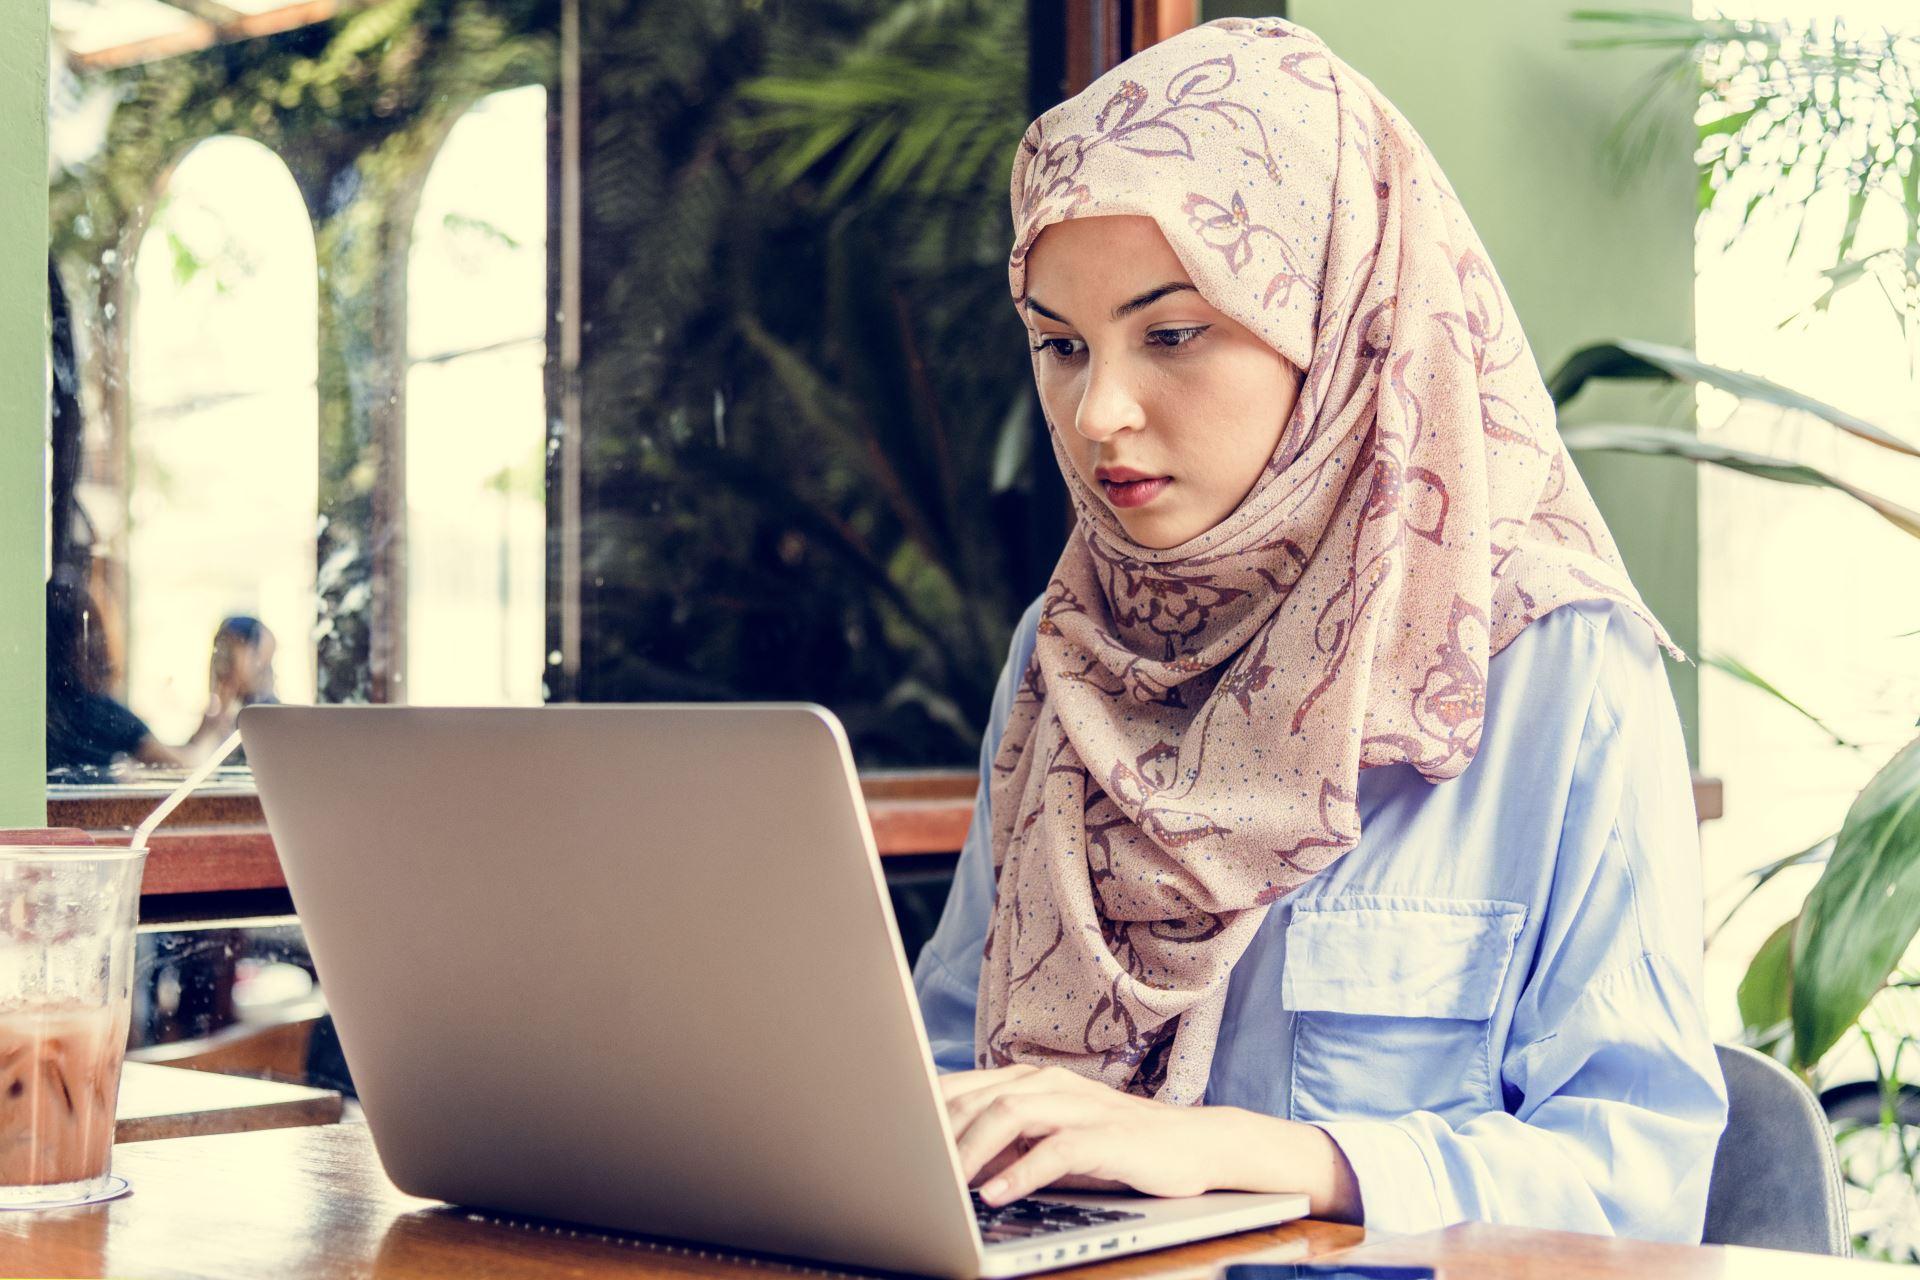 Excise Registration in UAE